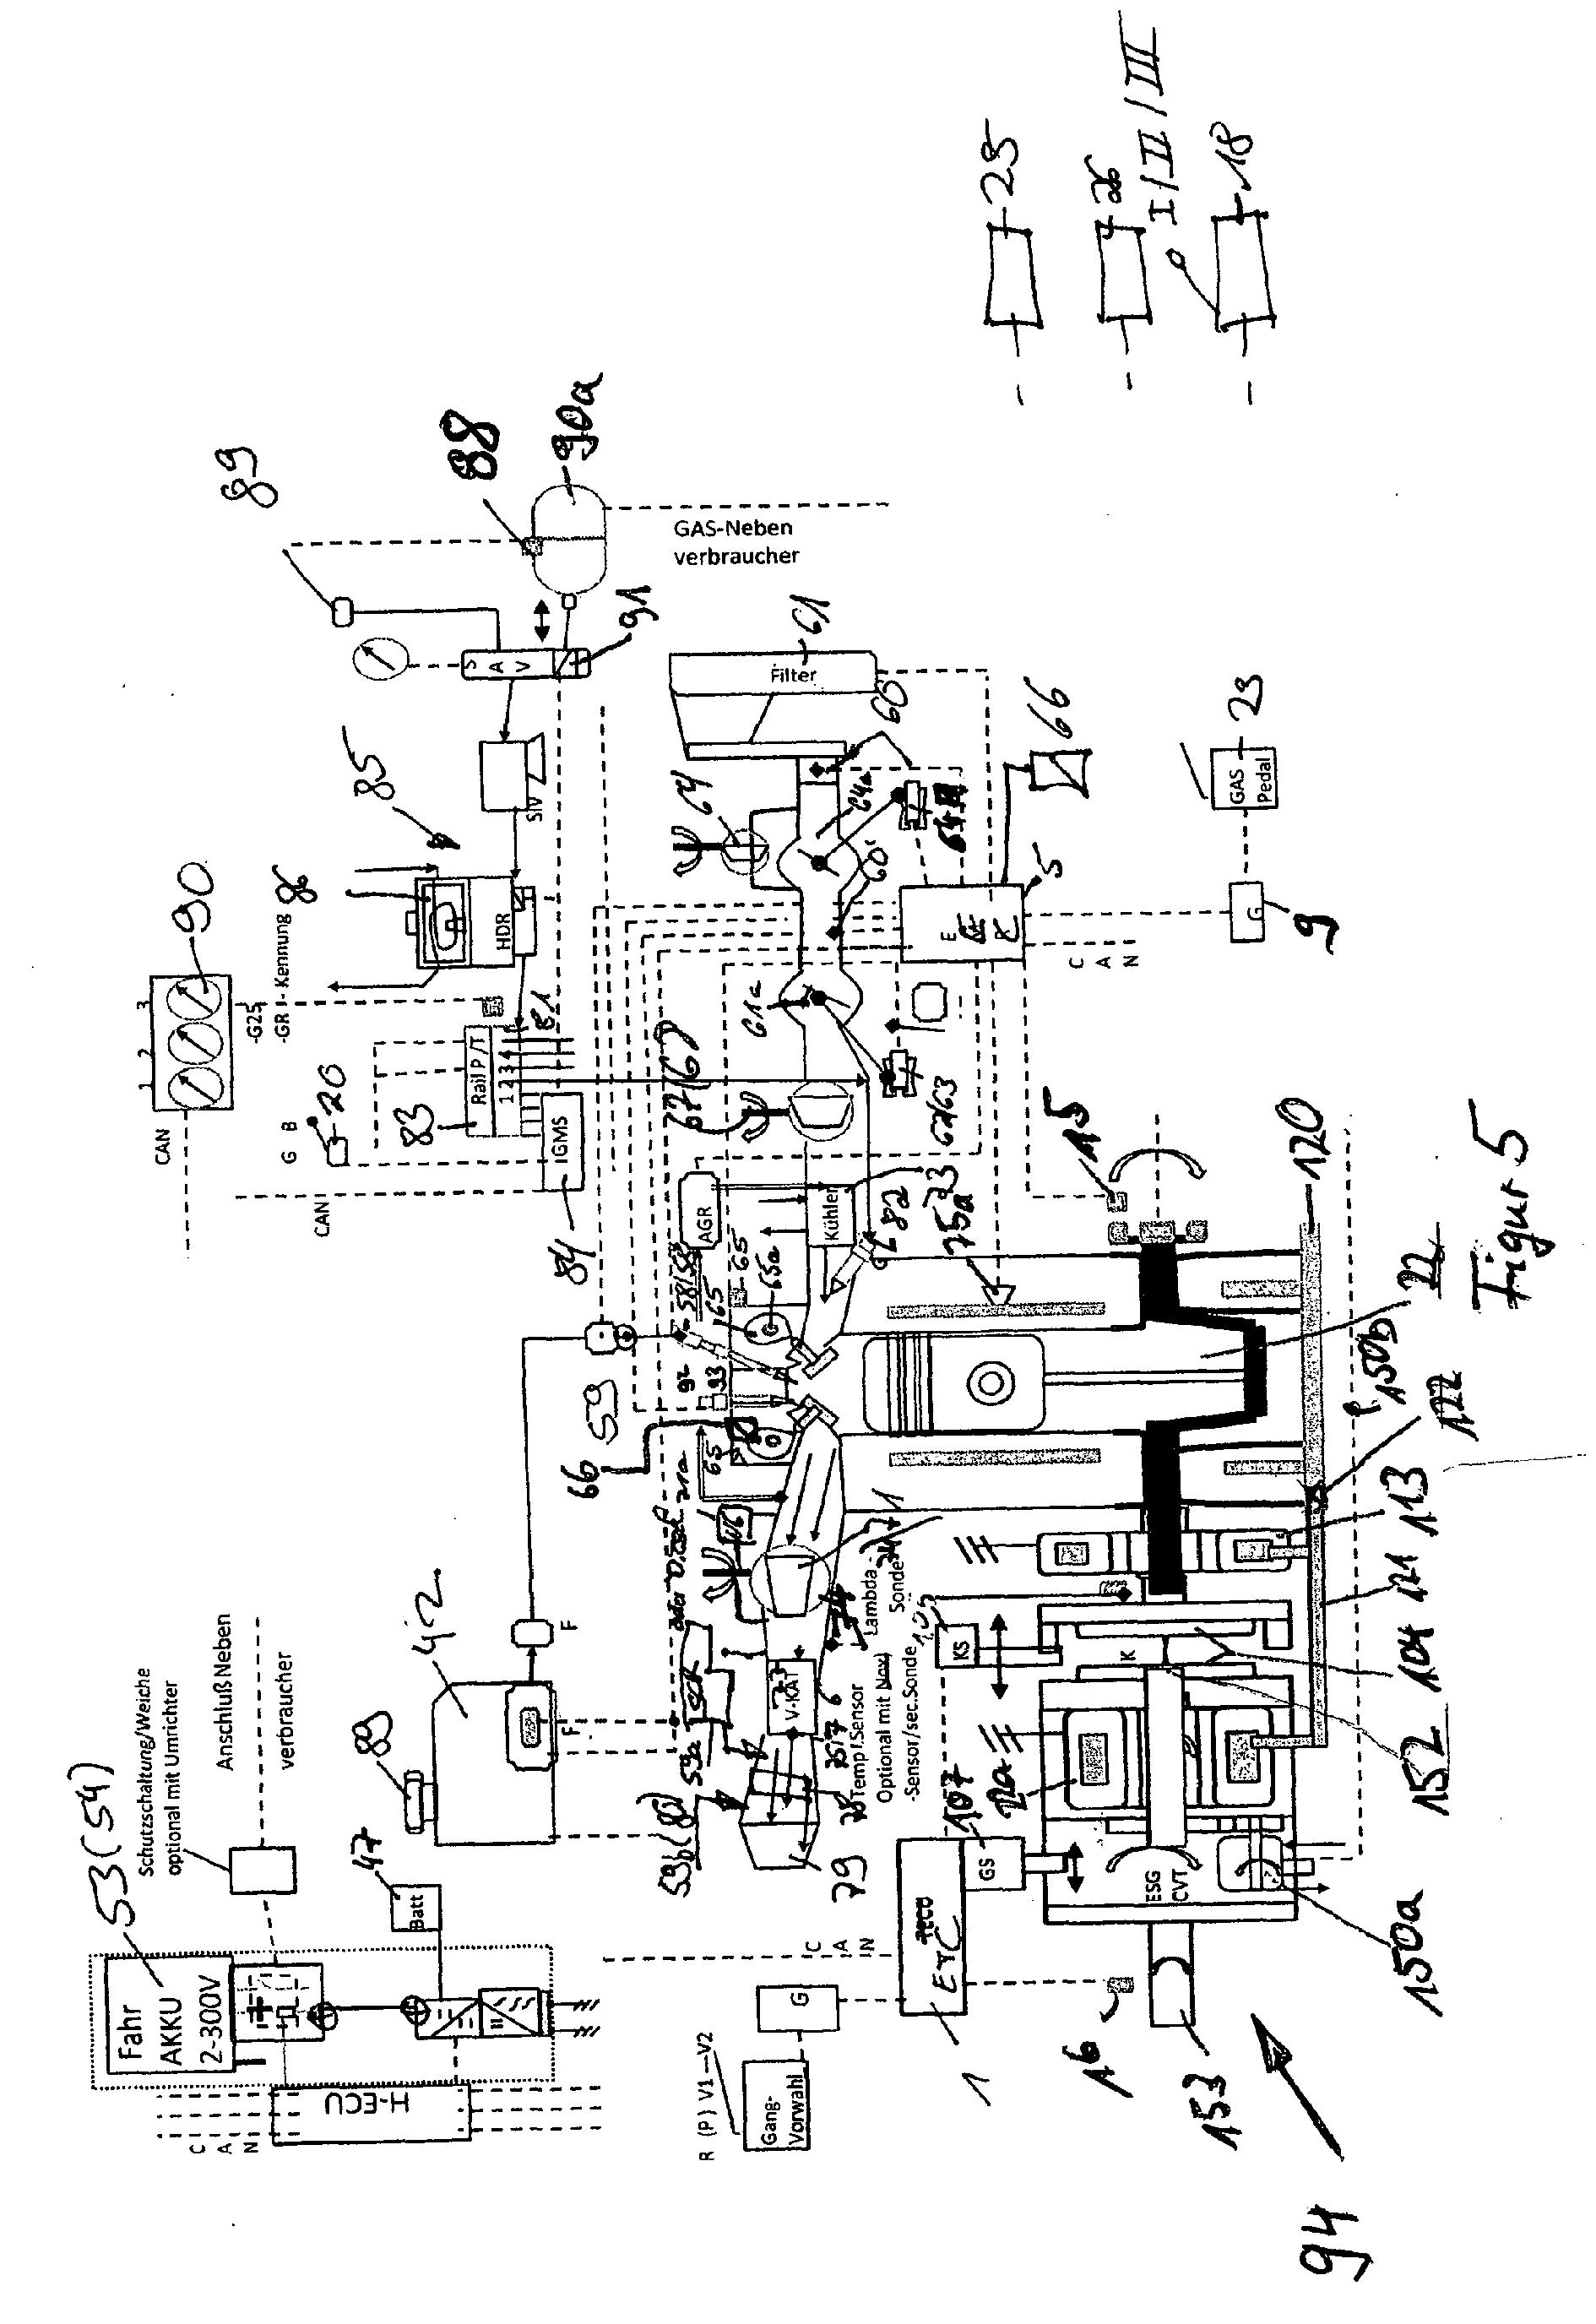 White Lawn Mower Parts Manual Wiring Diagram